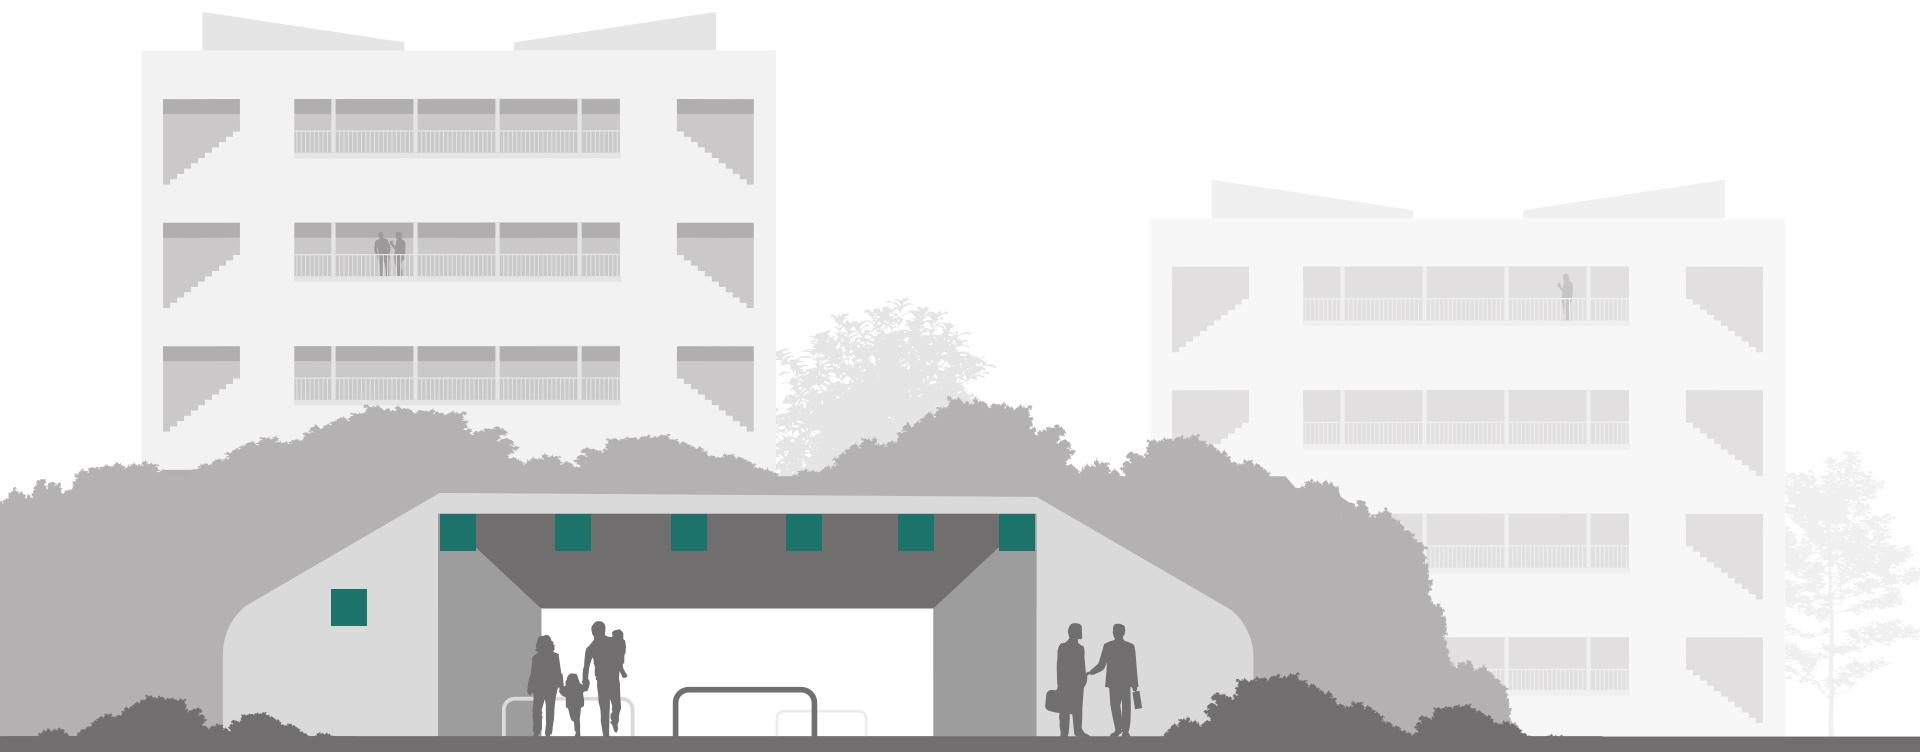 Community_Public_applications_subways